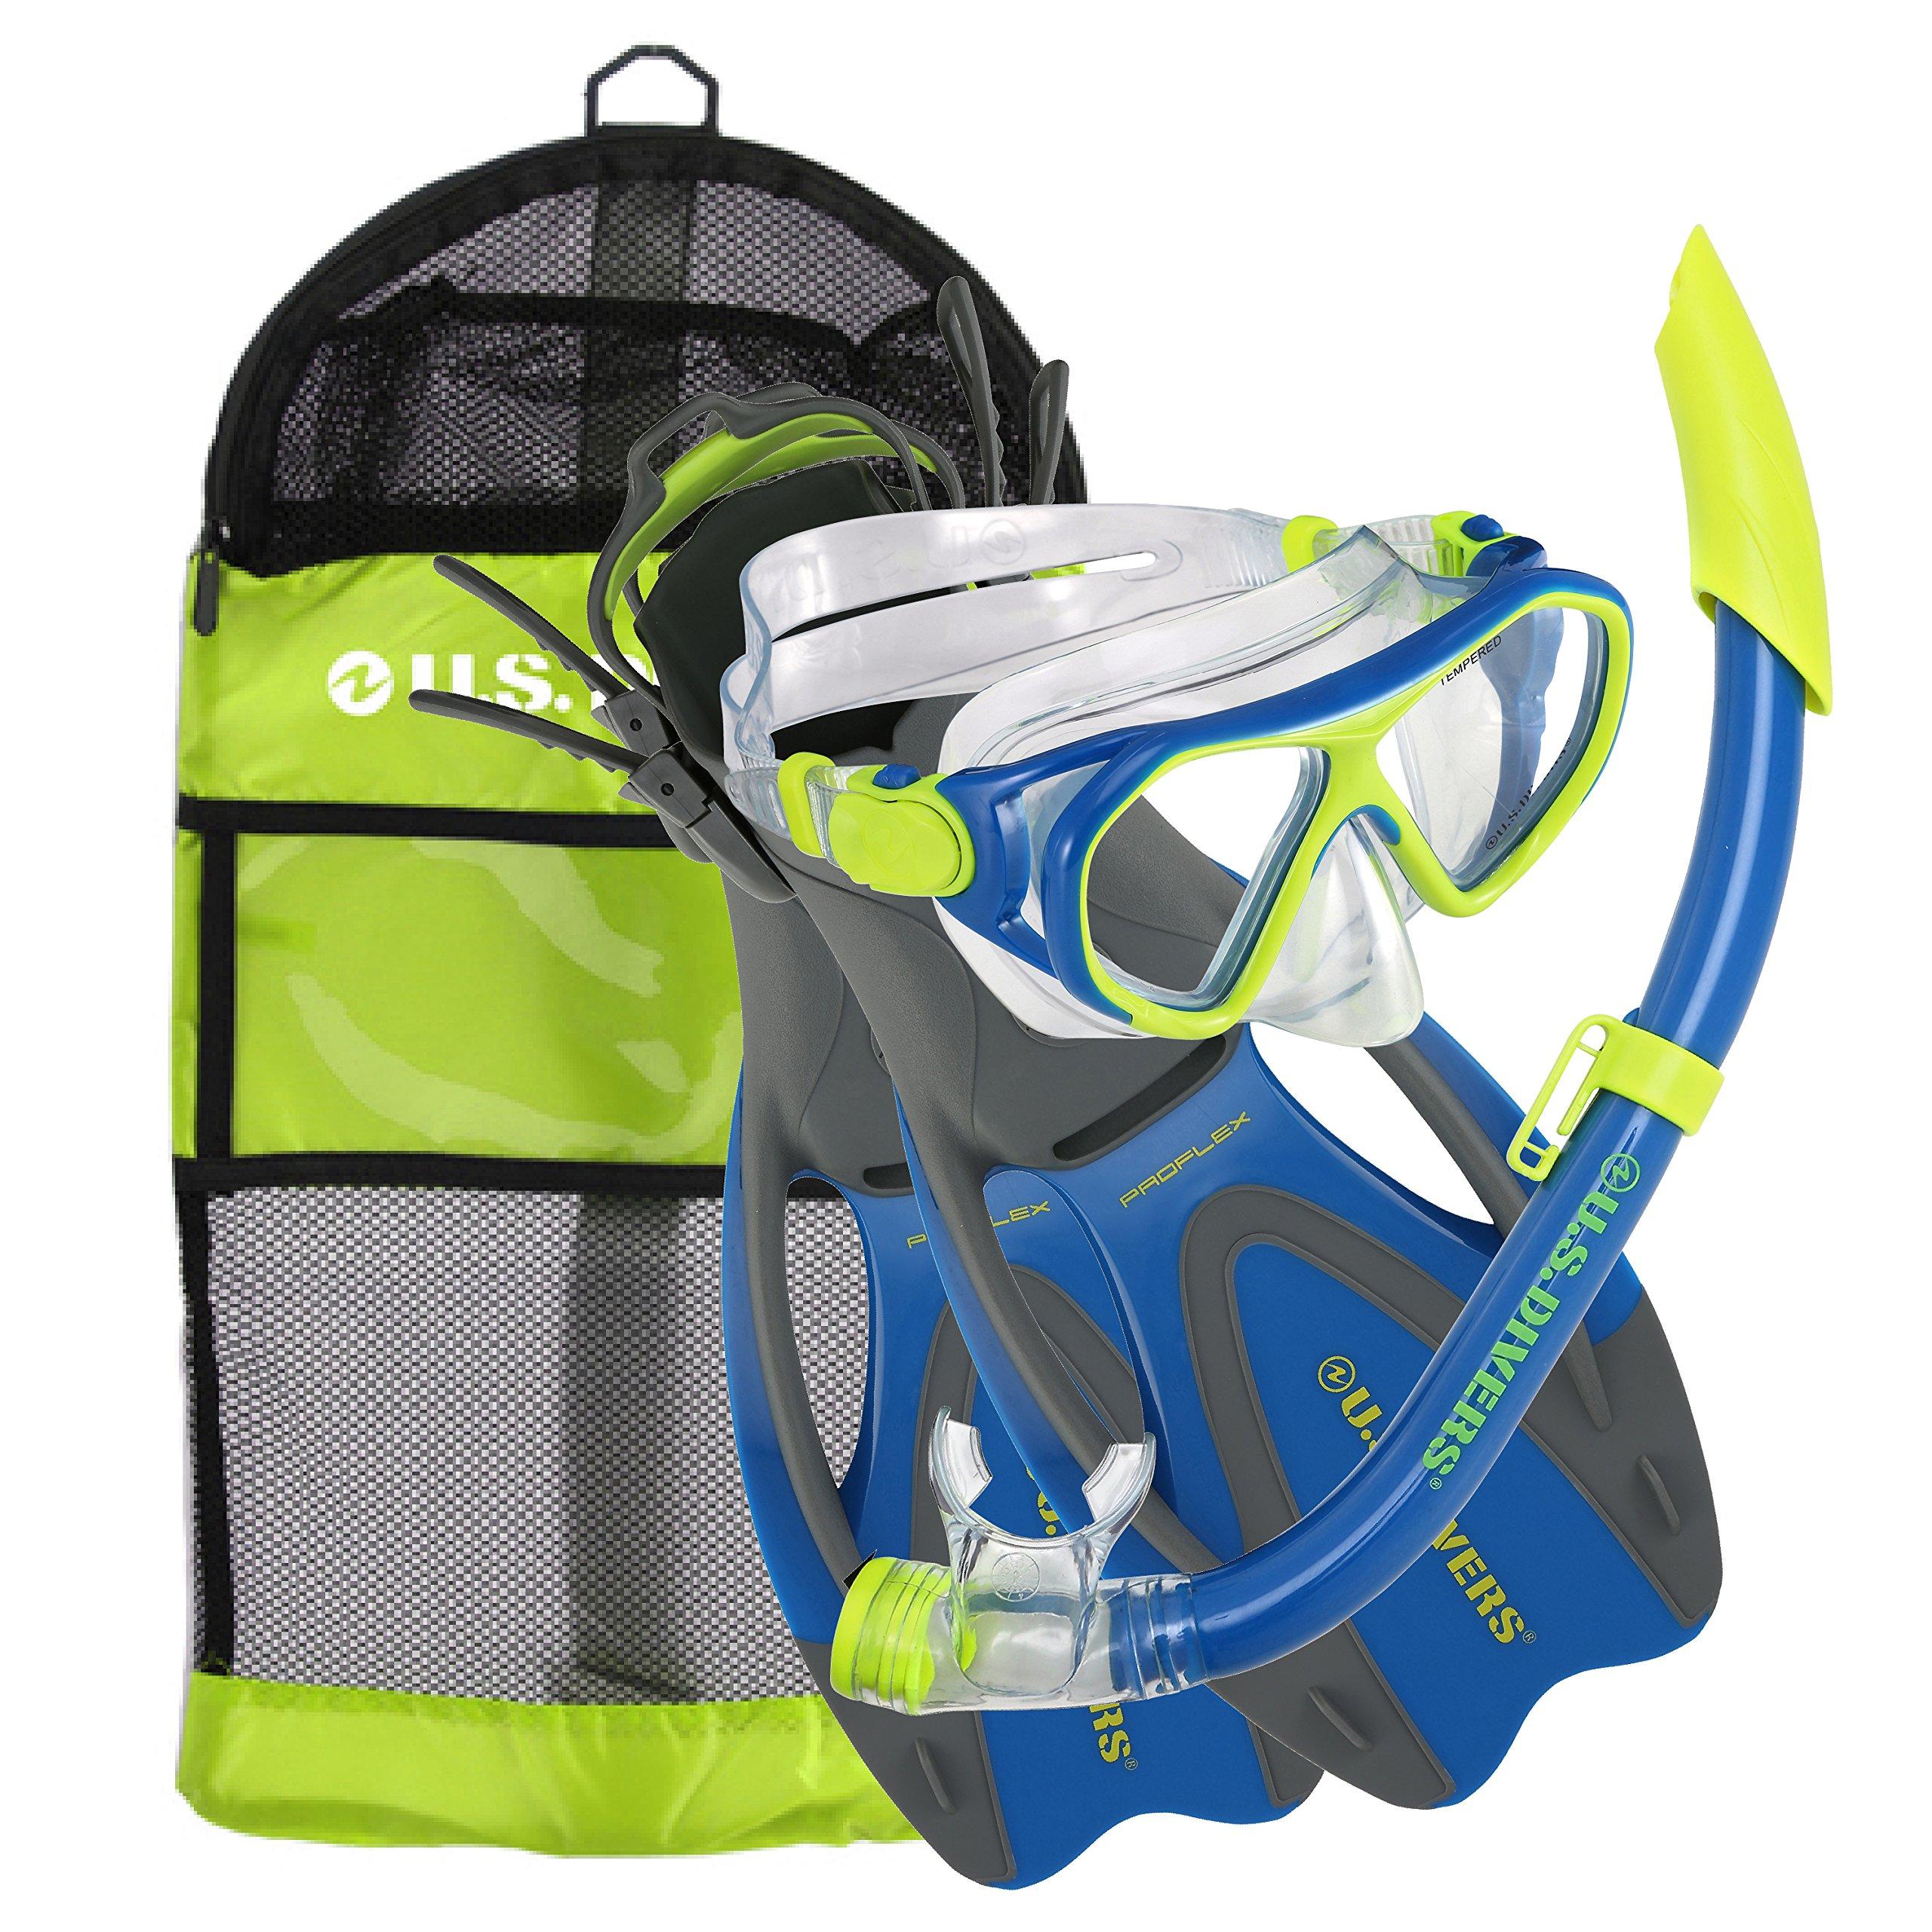 U.S. Divers Dorado Ii Pro Jr Mask, Sea Breeze Snorkel, Proflex Fins Set with Gear Bag, Yellow/Blue, Medium by U.S. Divers